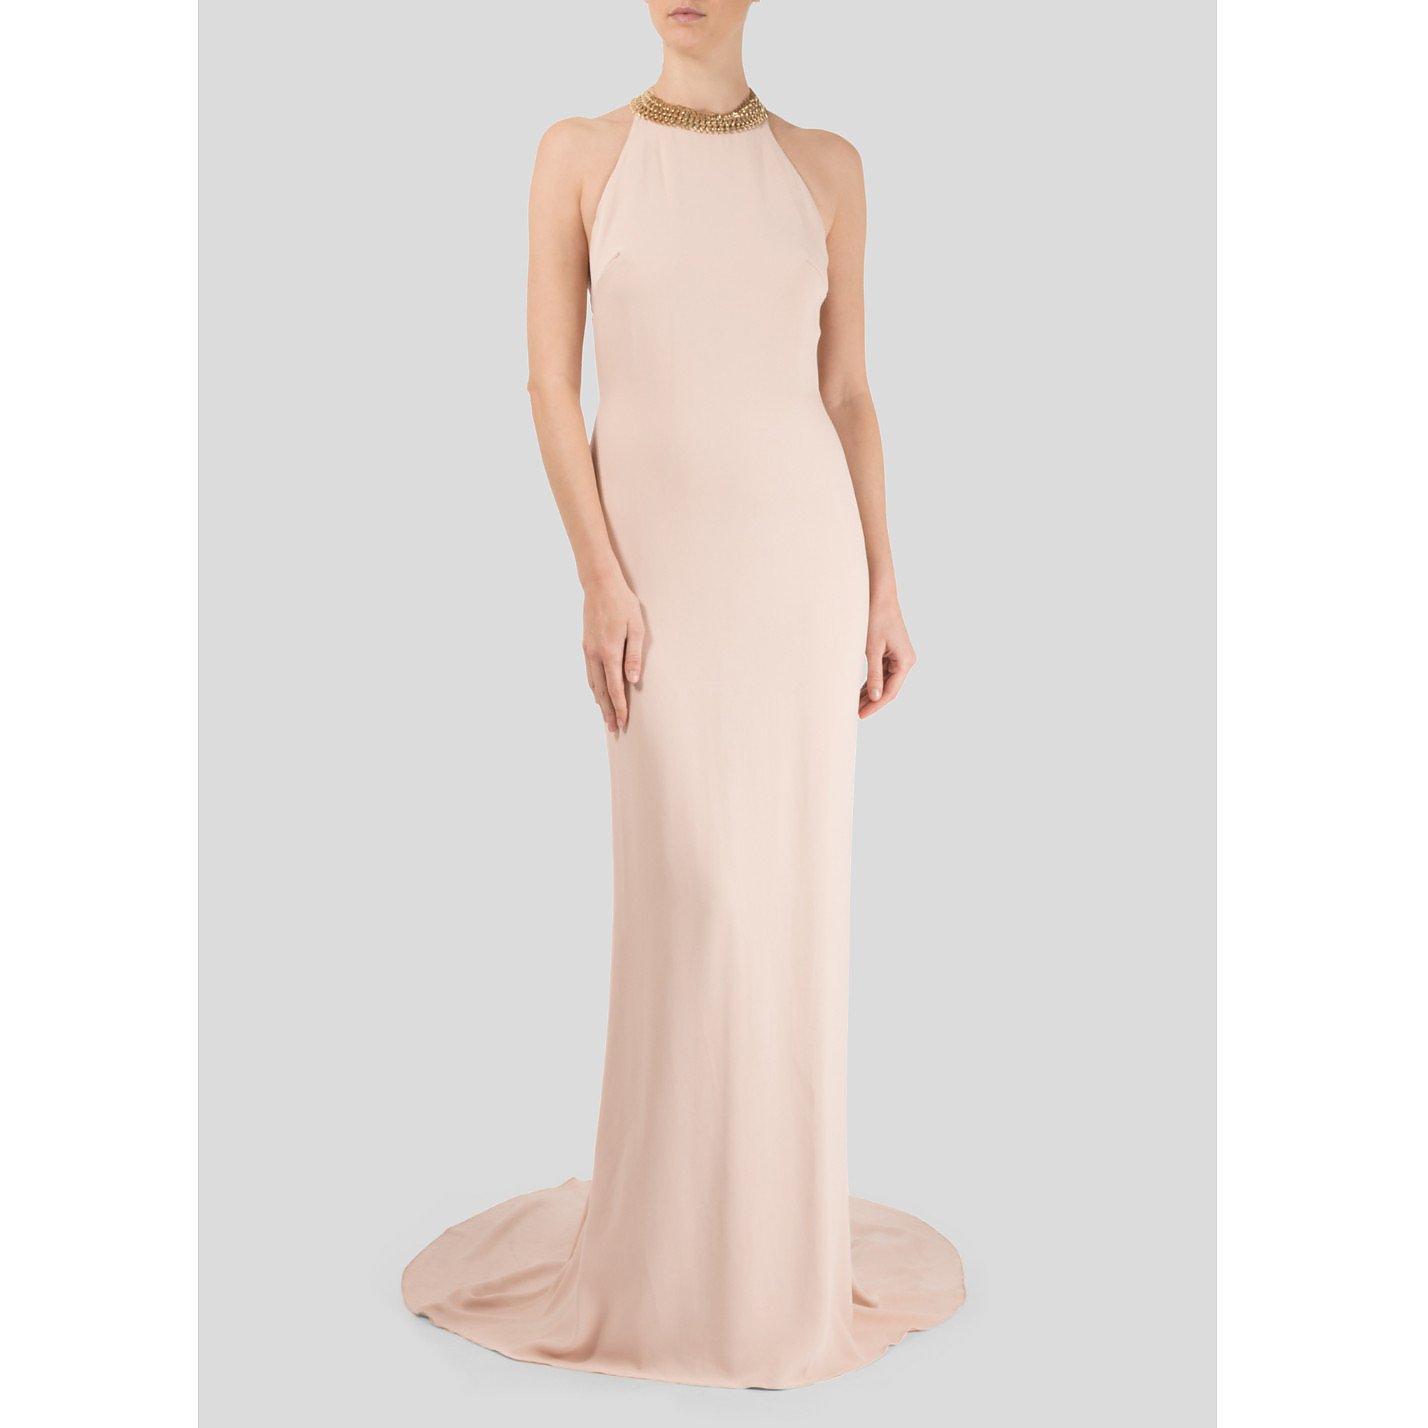 Stella McCartney Chain-Embellished Halterneck Gown